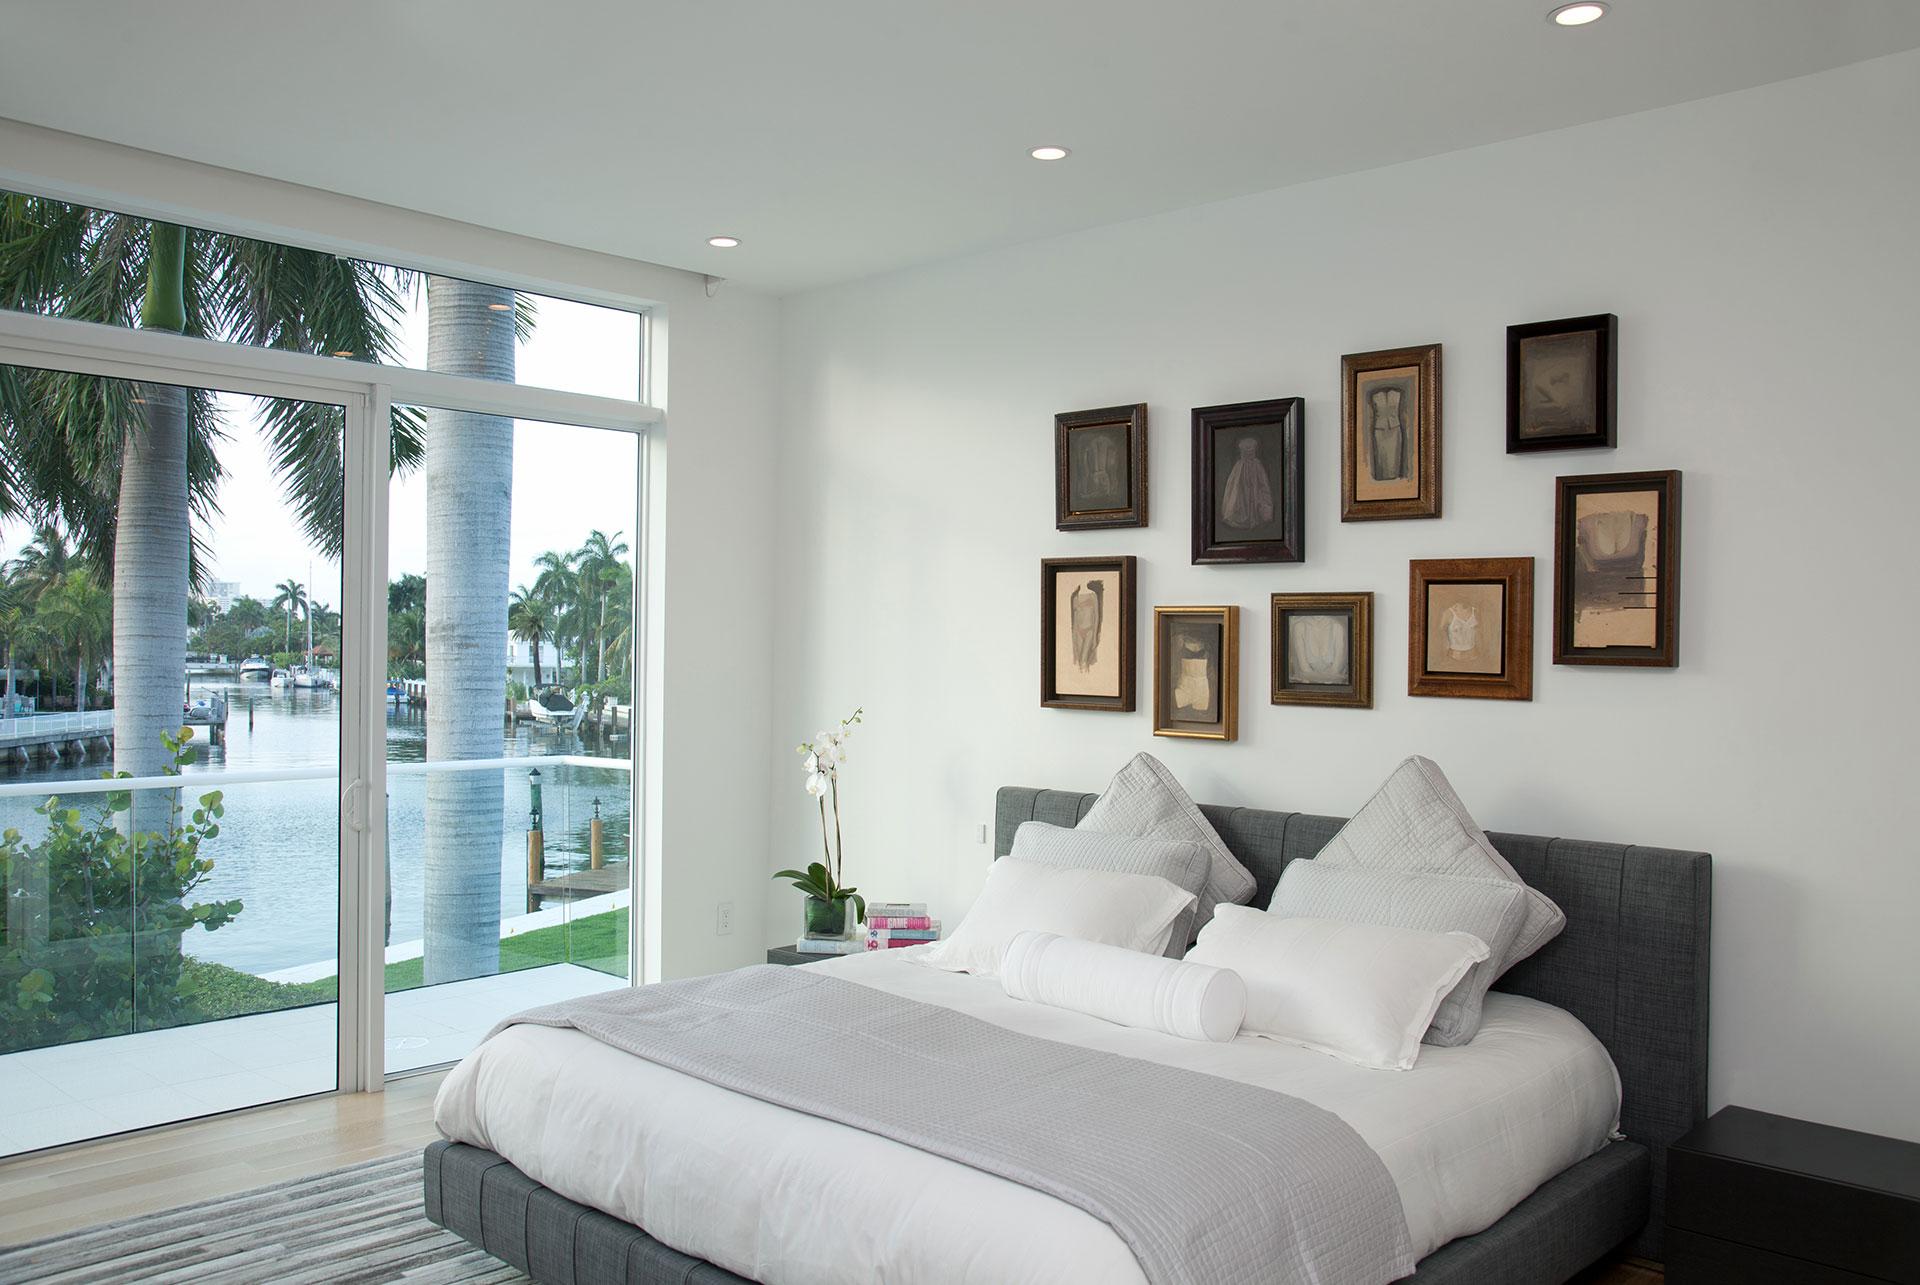 Interior Design bedroom view project in 96 Golden Beach Drive, Florida